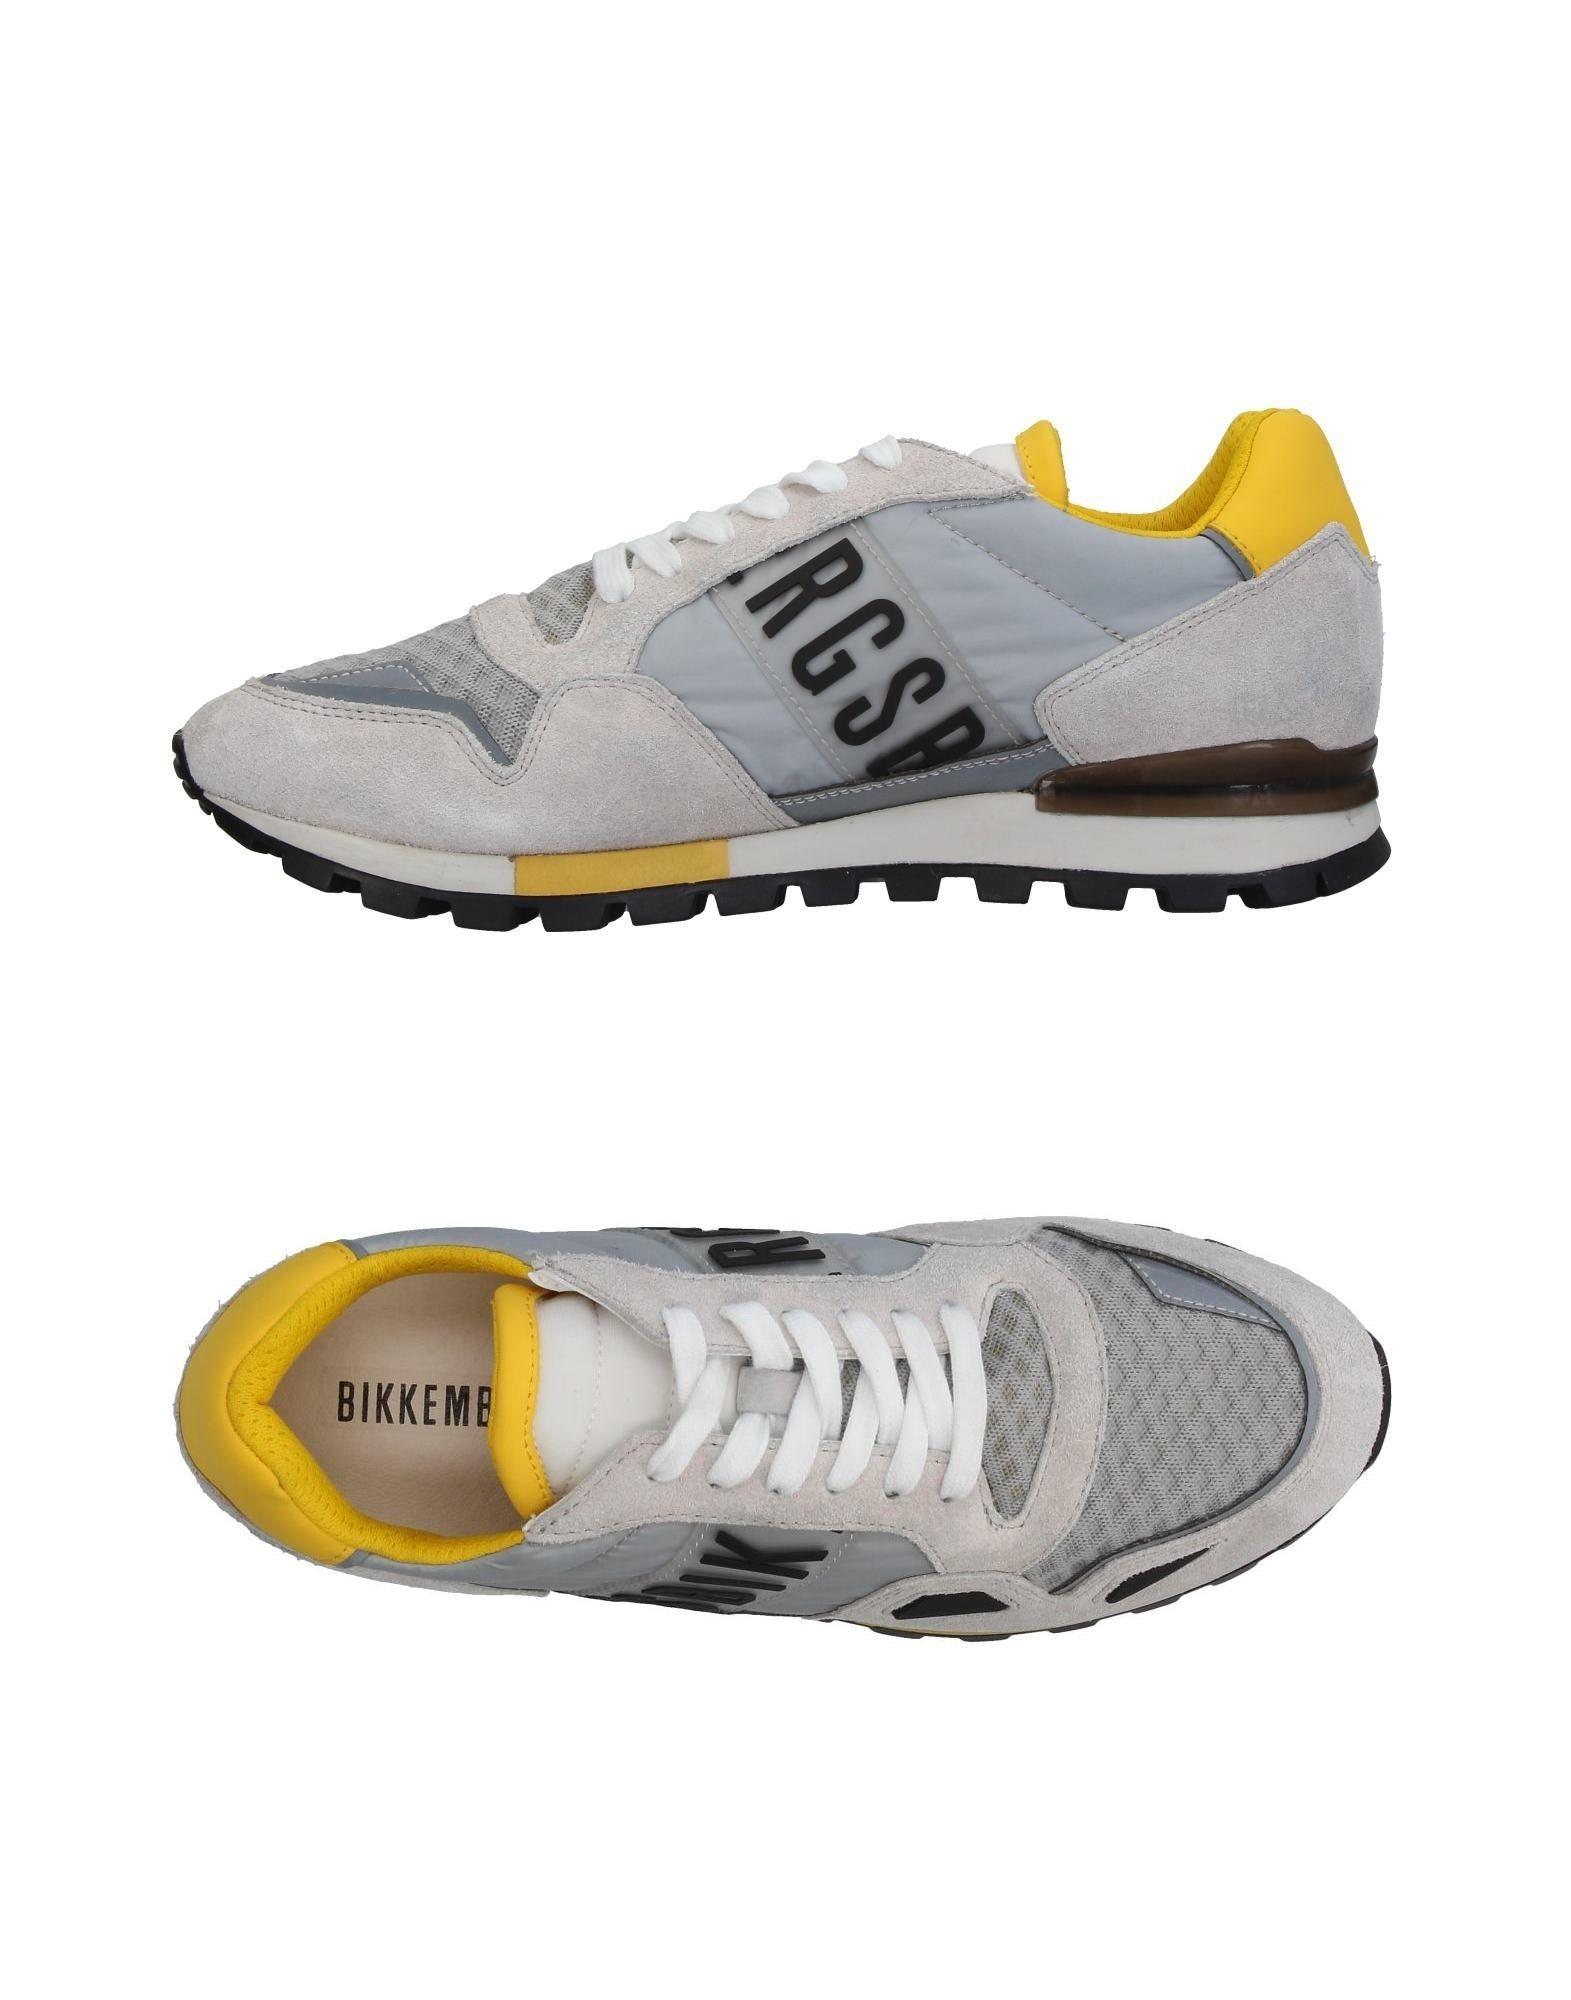 Moda 11417895UJ Sneakers Bikkembergs Uomo - 11417895UJ Moda 6b0b43